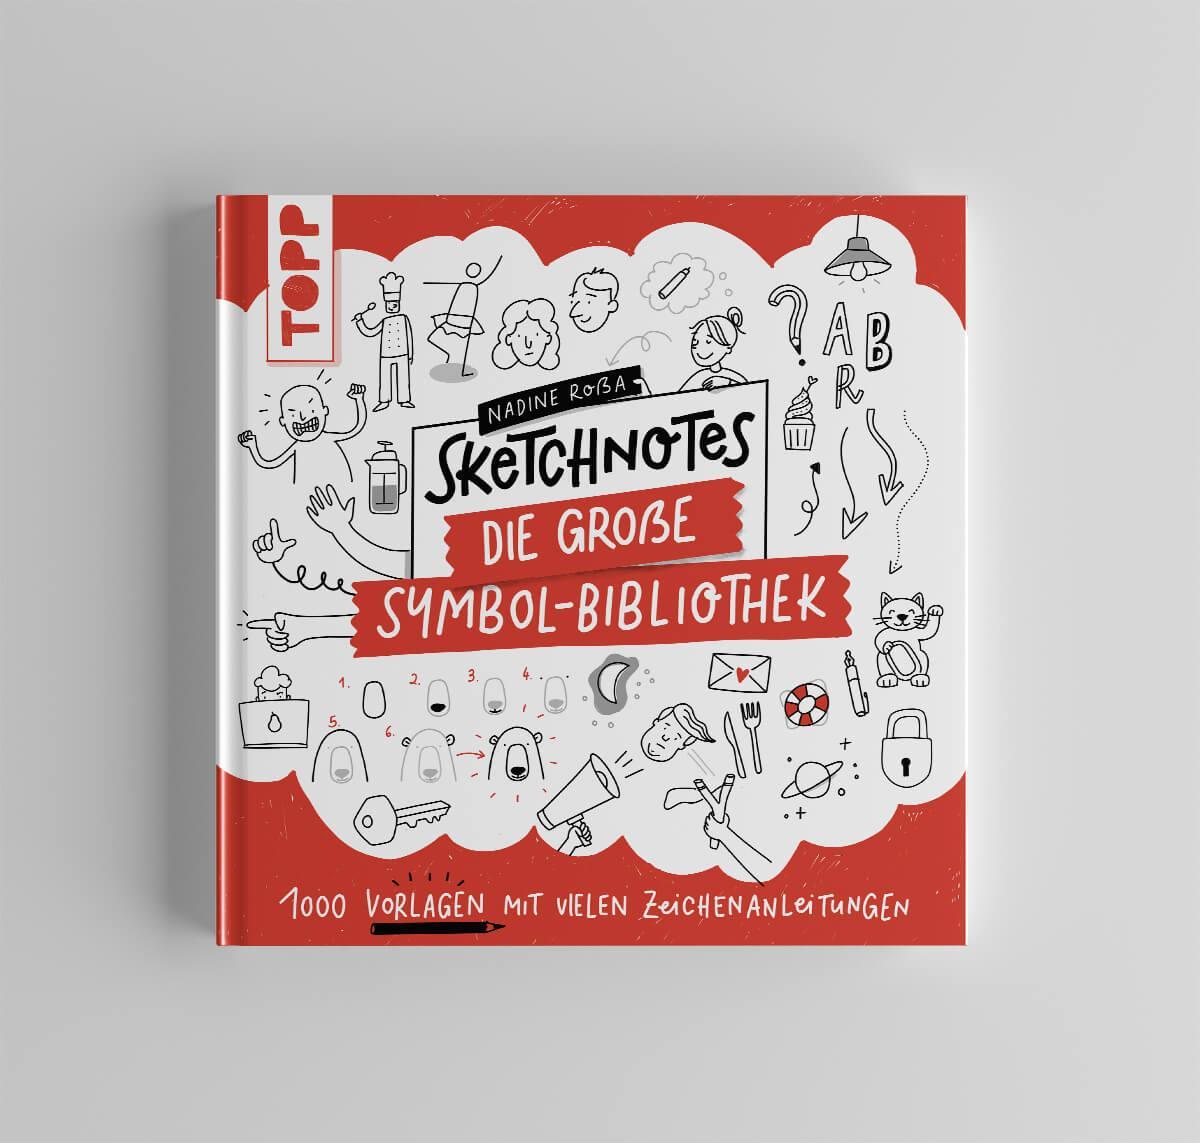 sketchnotes-symbolbibliothek-cover-klein.jpg